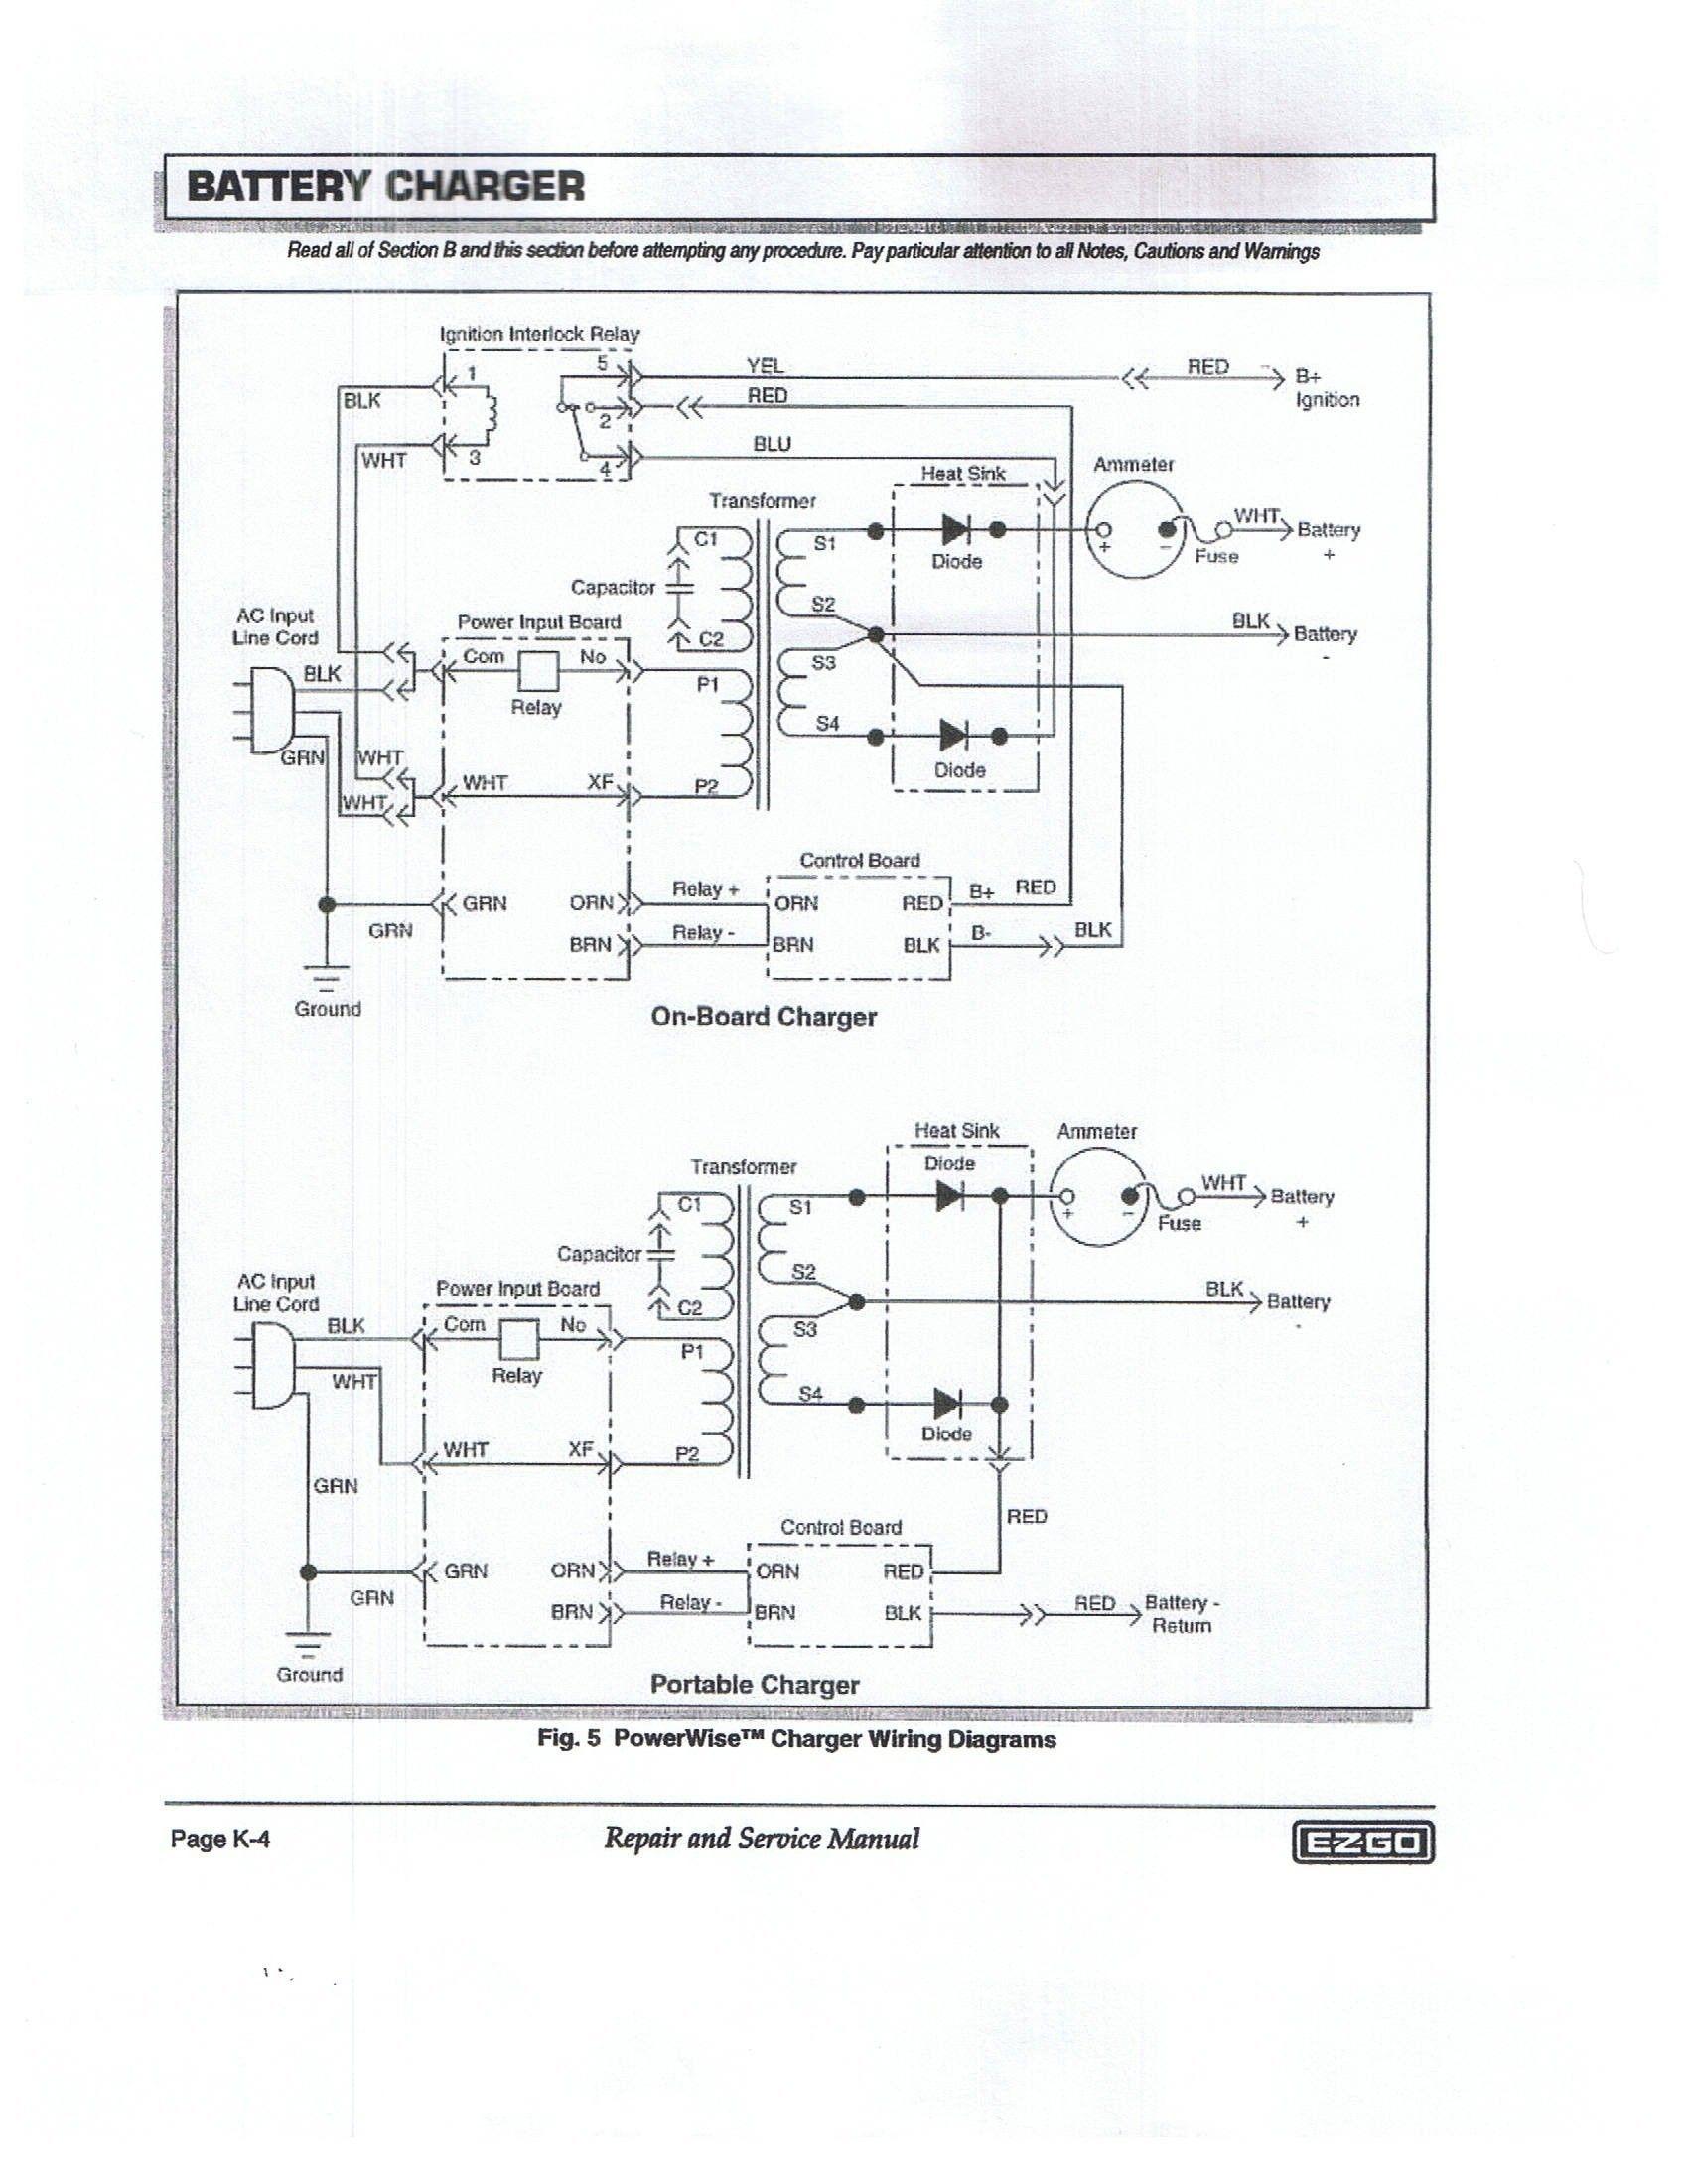 Unique Ezgo Txt Series Wiring Diagram Diagram Diagramsample Diagramtemplate Wiringdiagram Diagramchart Worksheet Worksheettem Diagram Wire Diagram Chart